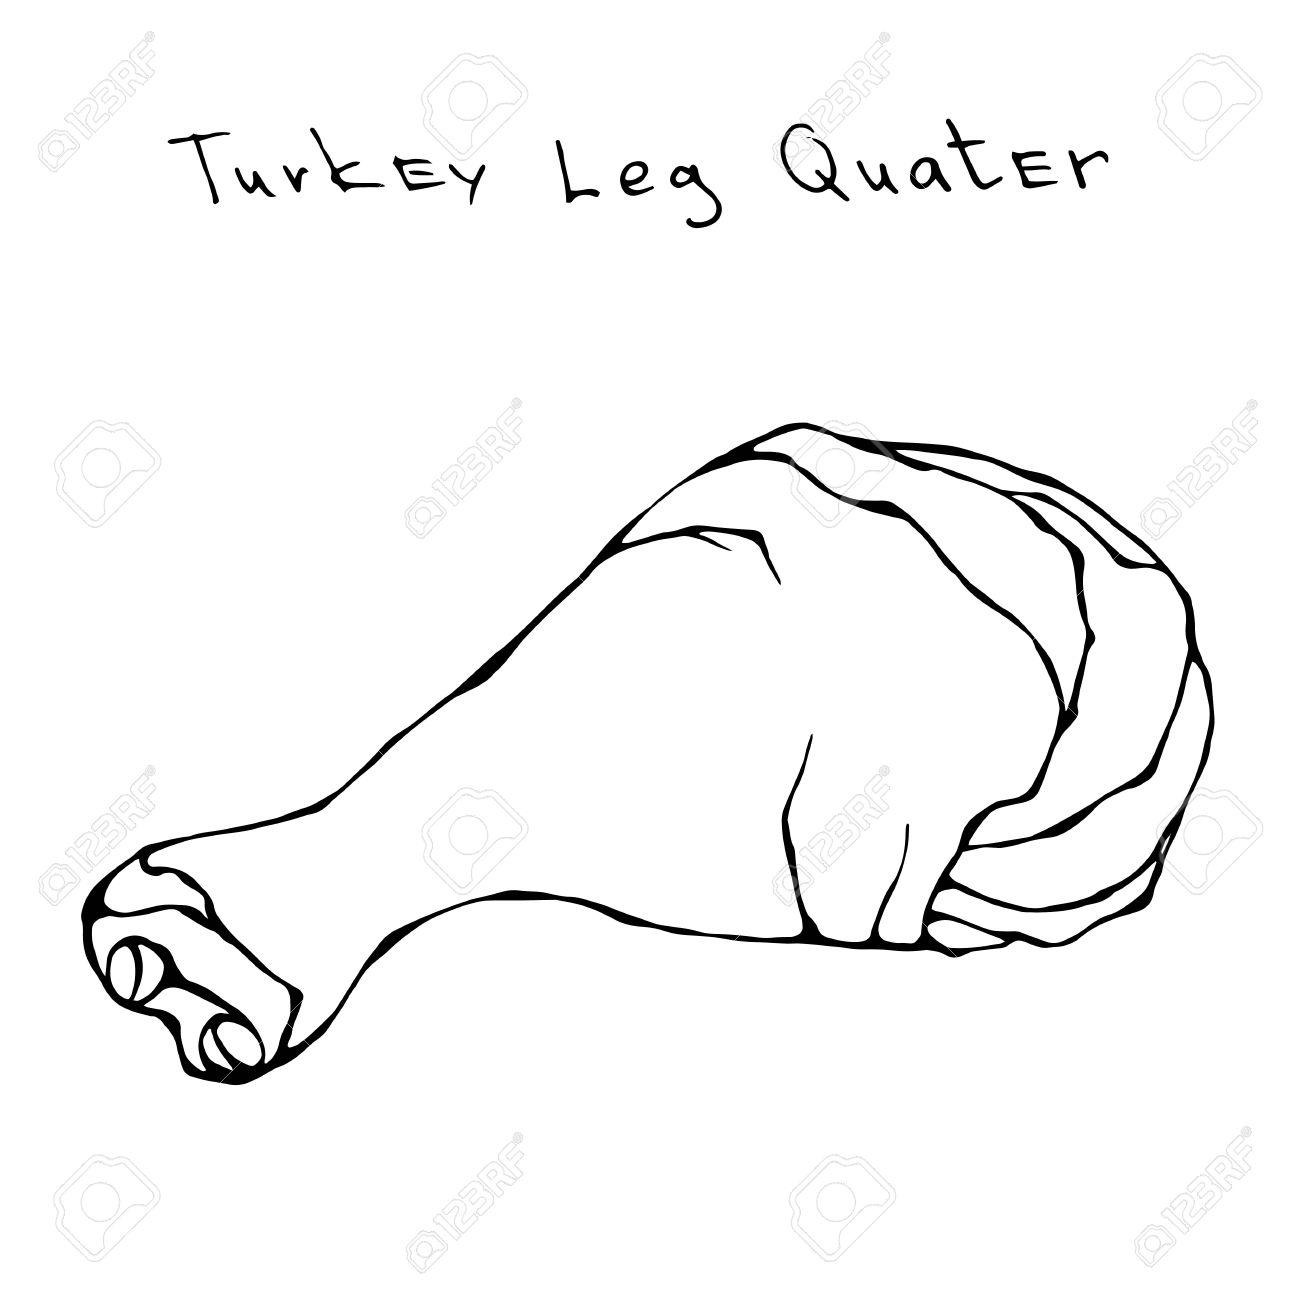 1300x1300 Raw Turkey Leg Quater. Fresh Fowl Meat Carcass. Realistic Vector